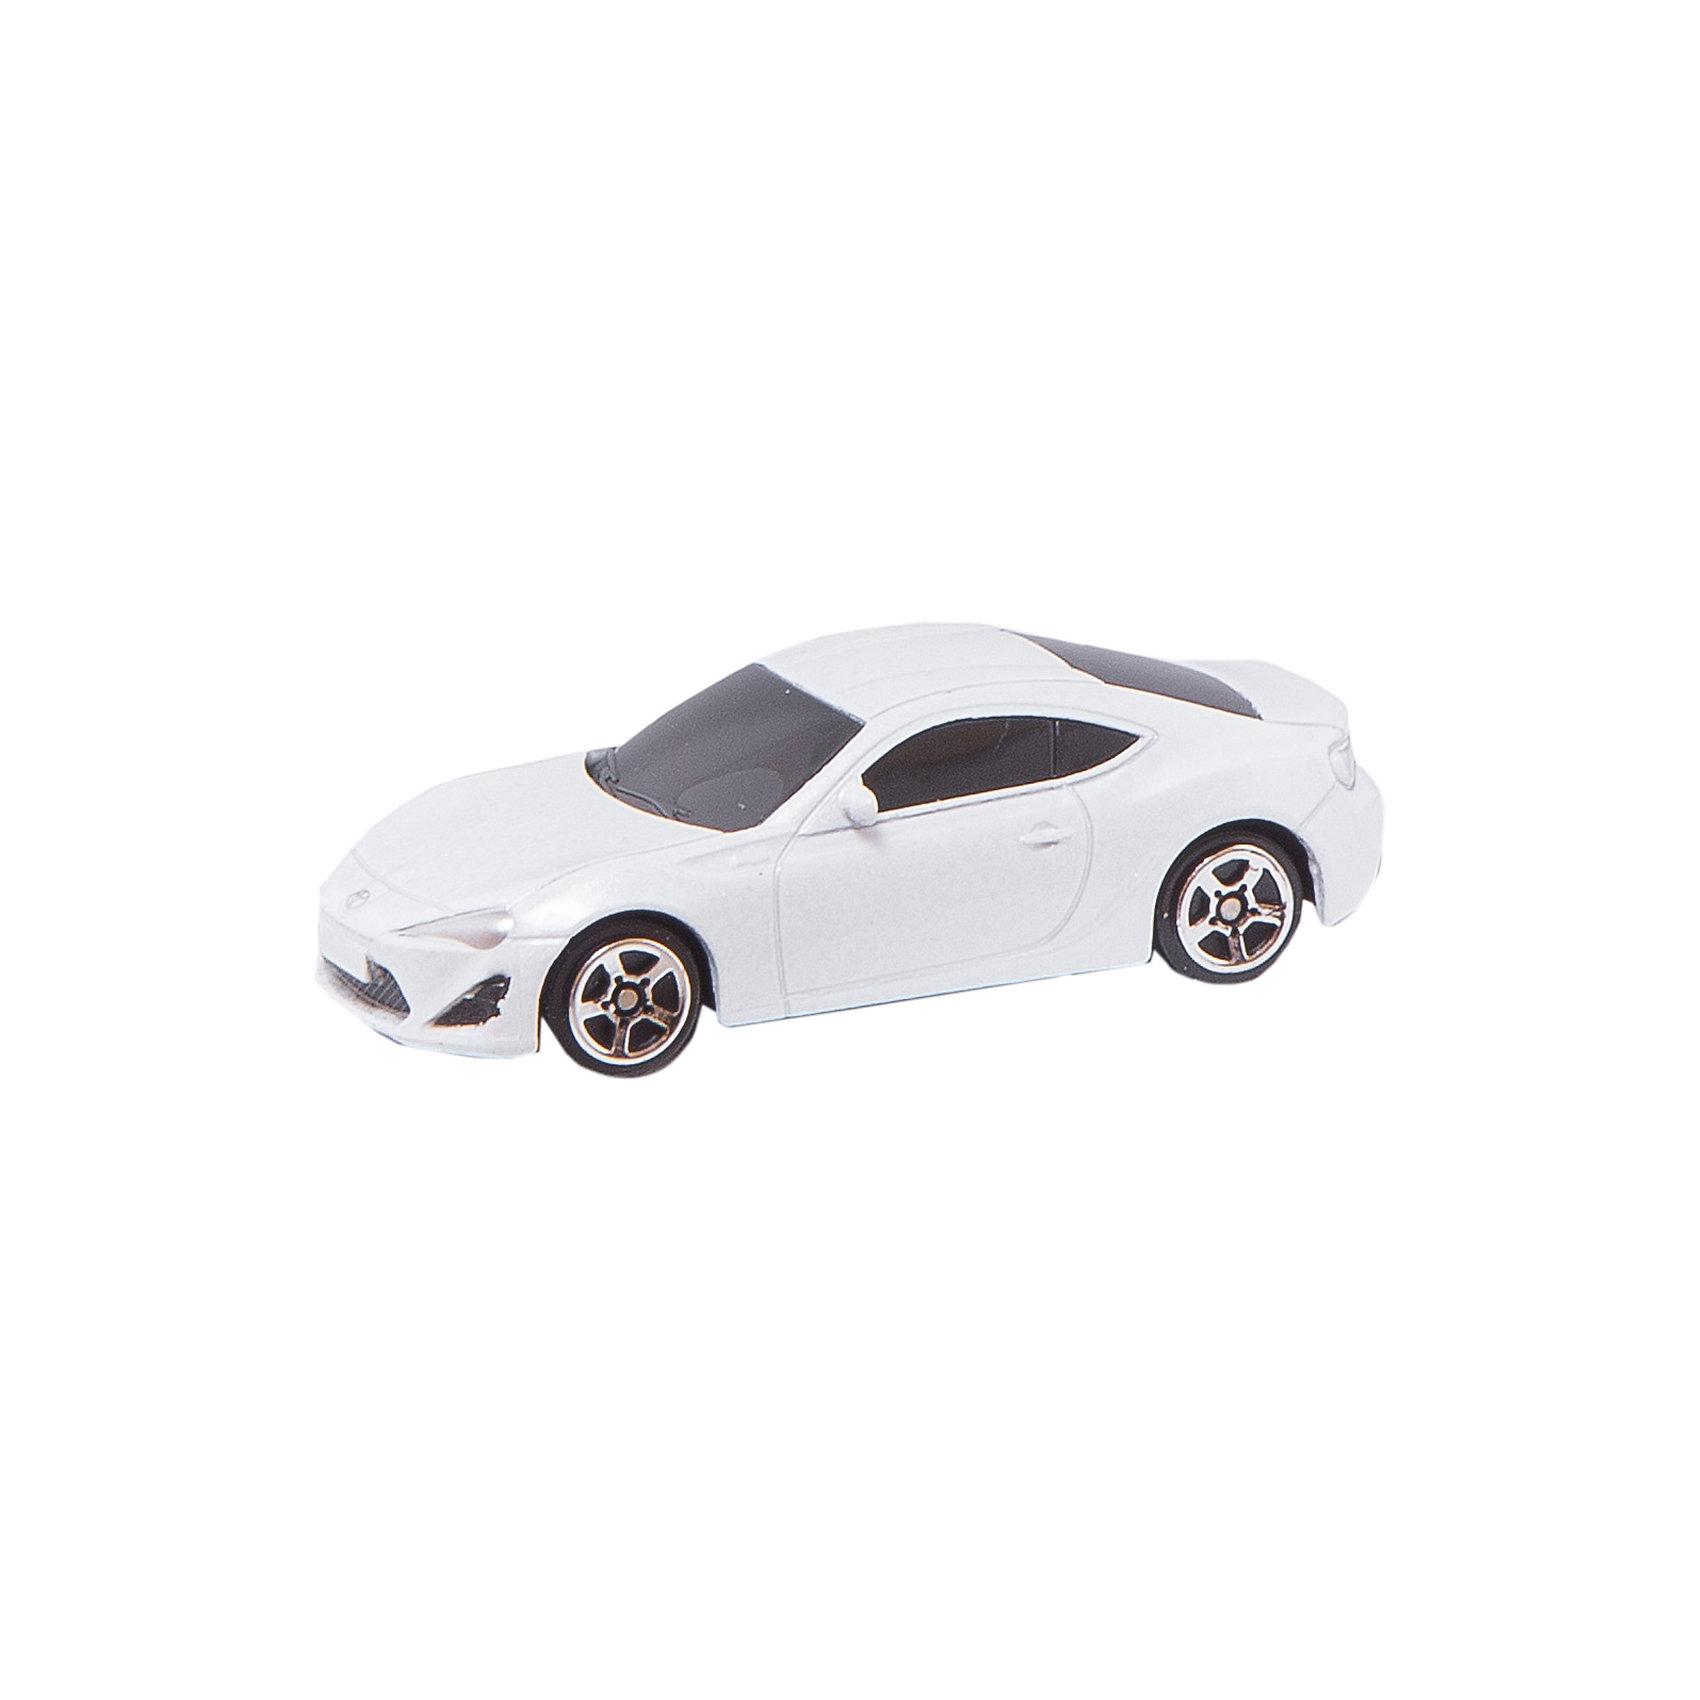 Машинка Toyota 86 Jeans 3, AutotimeМашинки<br><br><br>Ширина мм: 90<br>Глубина мм: 42<br>Высота мм: 40<br>Вес г: 14<br>Возраст от месяцев: 36<br>Возраст до месяцев: 2147483647<br>Пол: Мужской<br>Возраст: Детский<br>SKU: 5584074